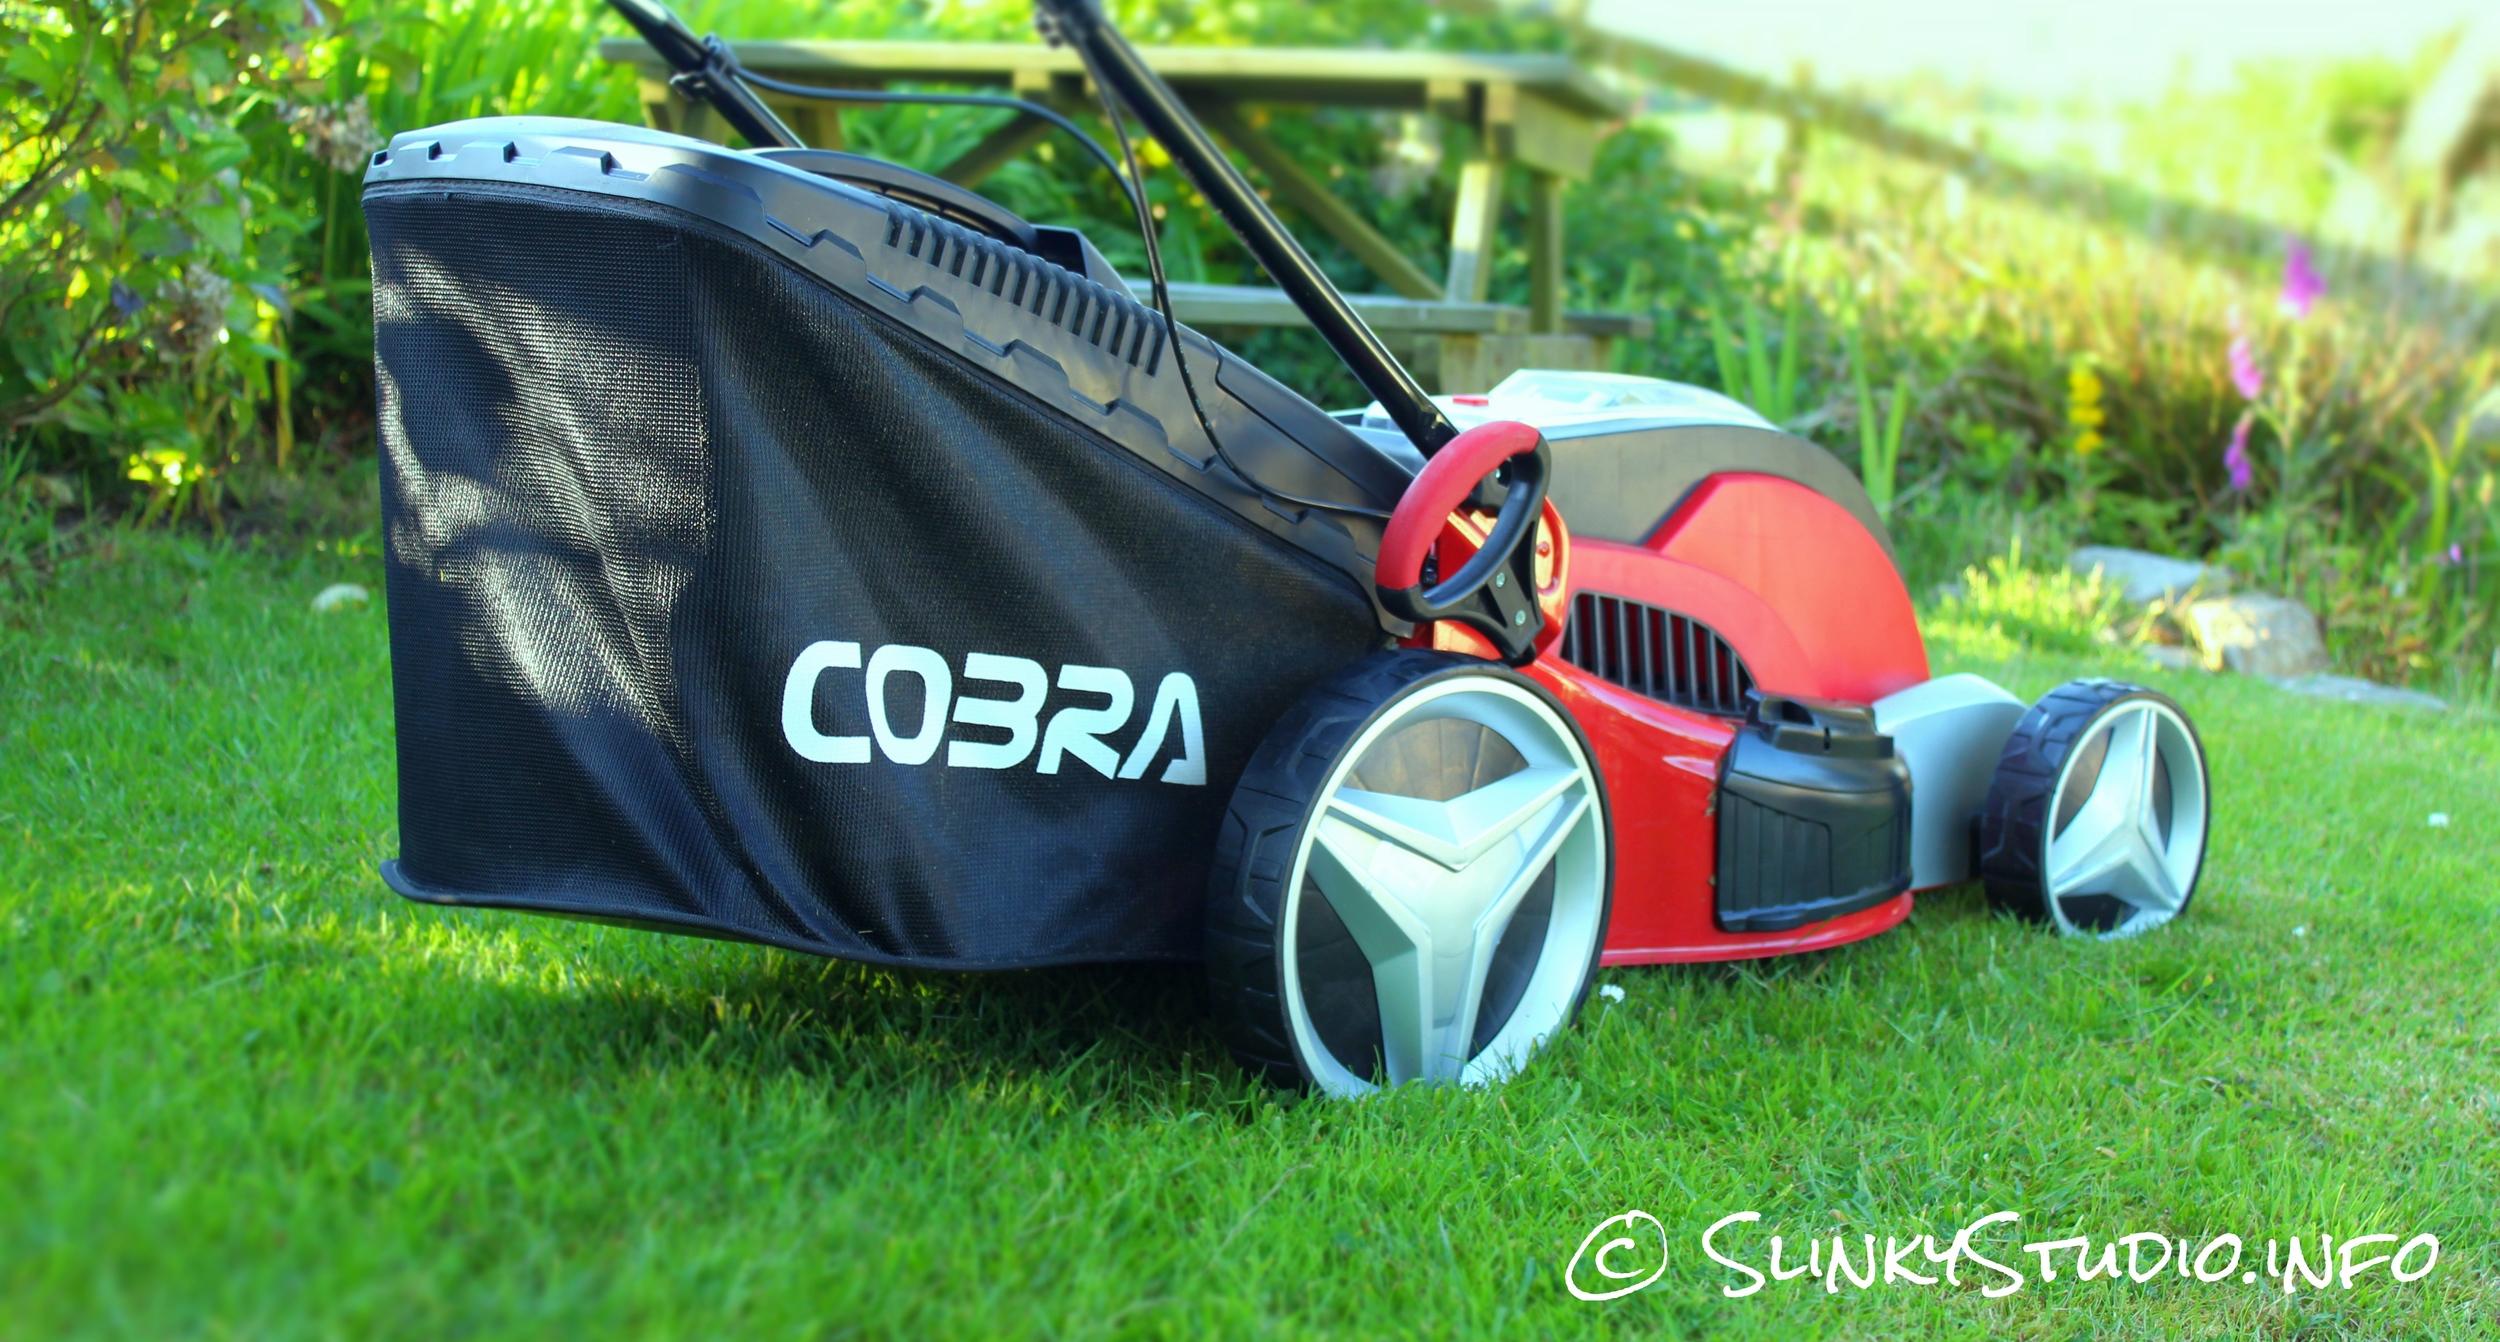 Cobra MX46S40V Cordless Lawnmower Grass Bag Side View